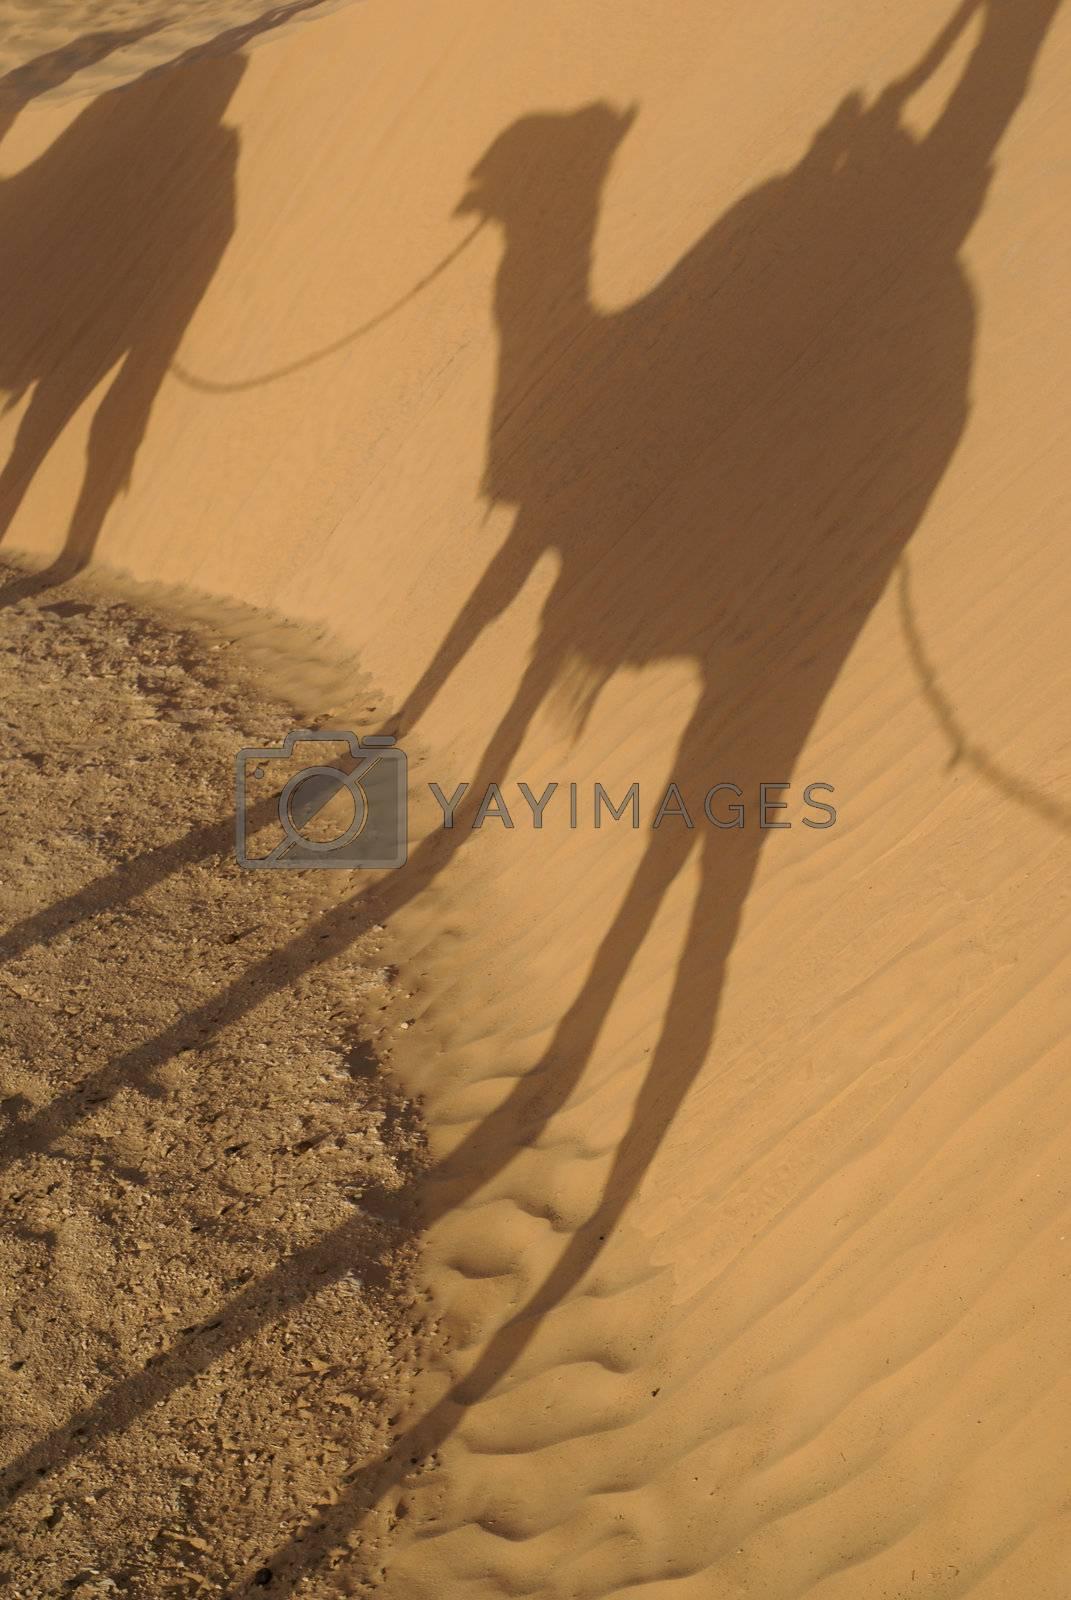 Royalty free image of Dromedary in Sahara by mimocas29